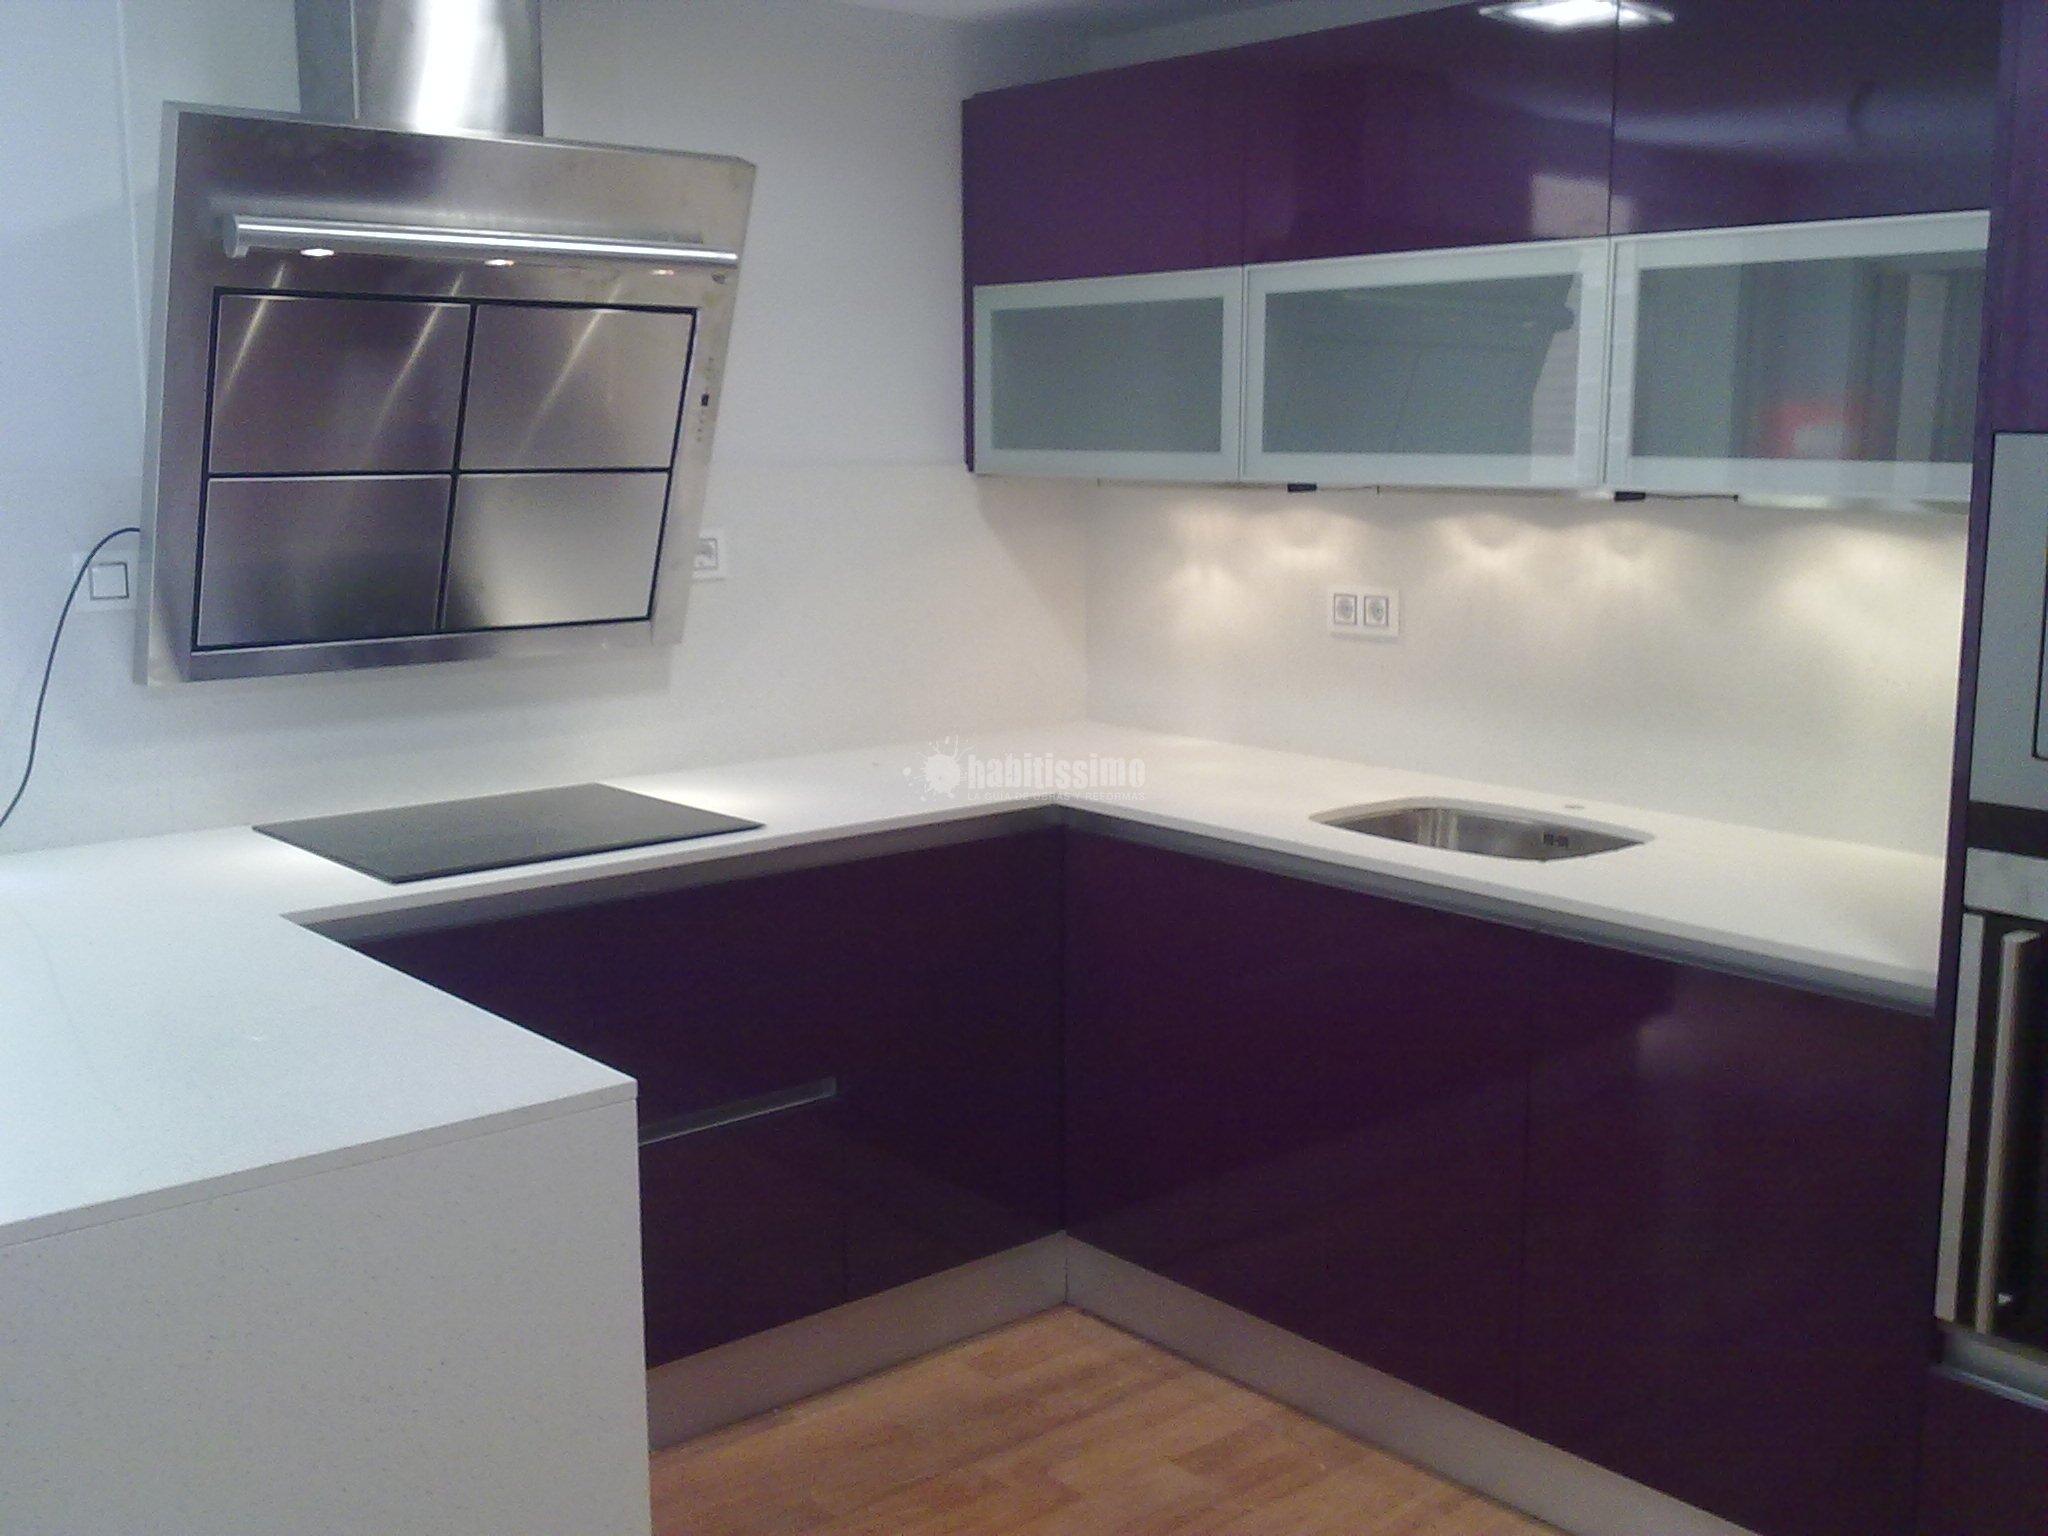 Ofertas muebles de cocina en murcia ideas for Easy ofertas muebles de cocina